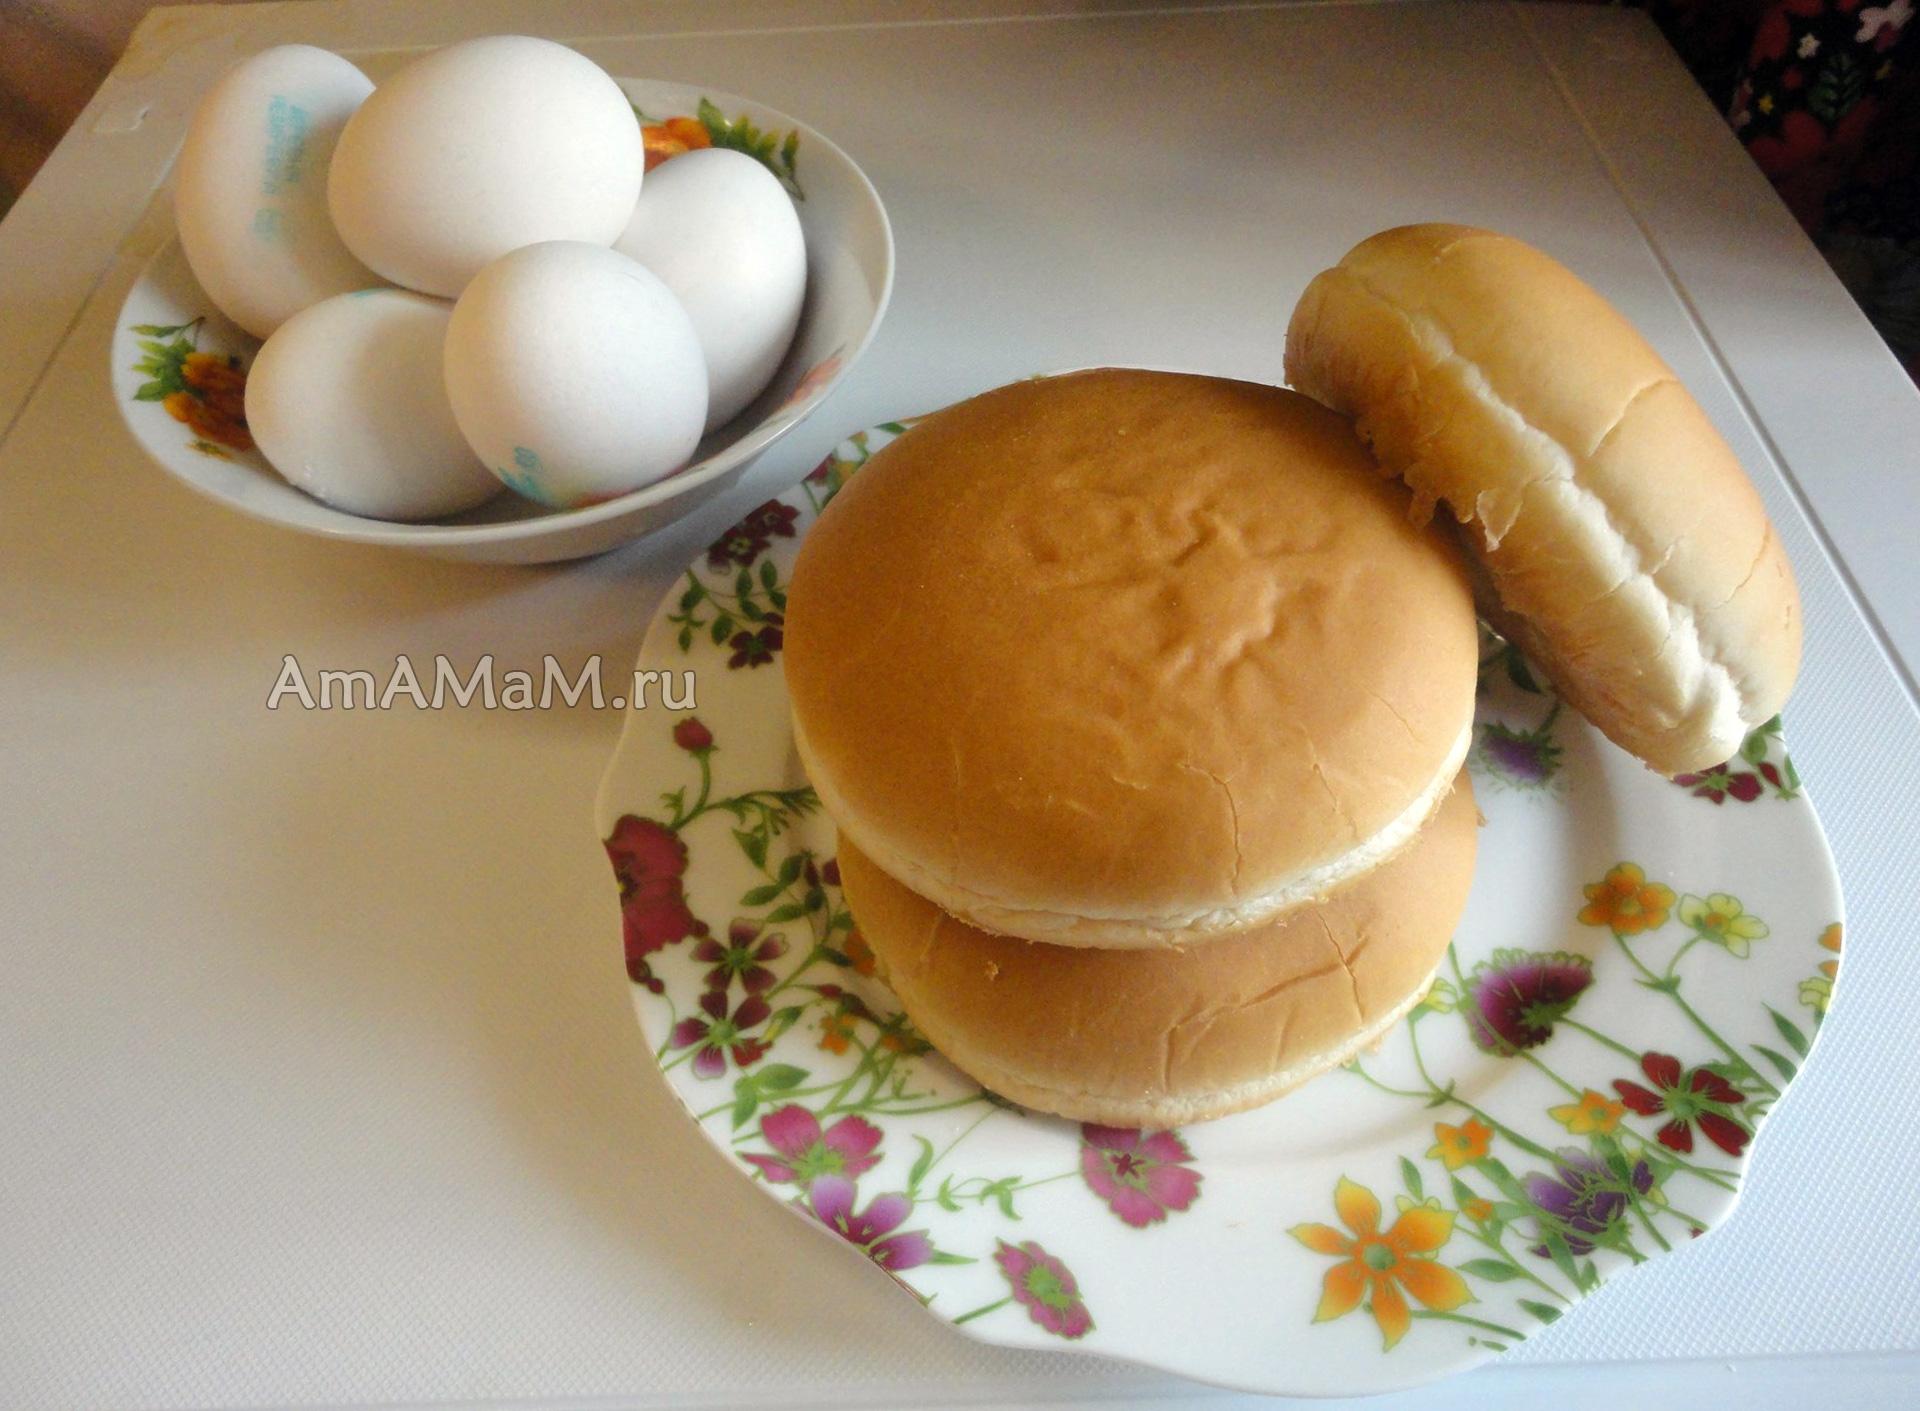 Рецепт булочек для гамбургеров в домашних условиях